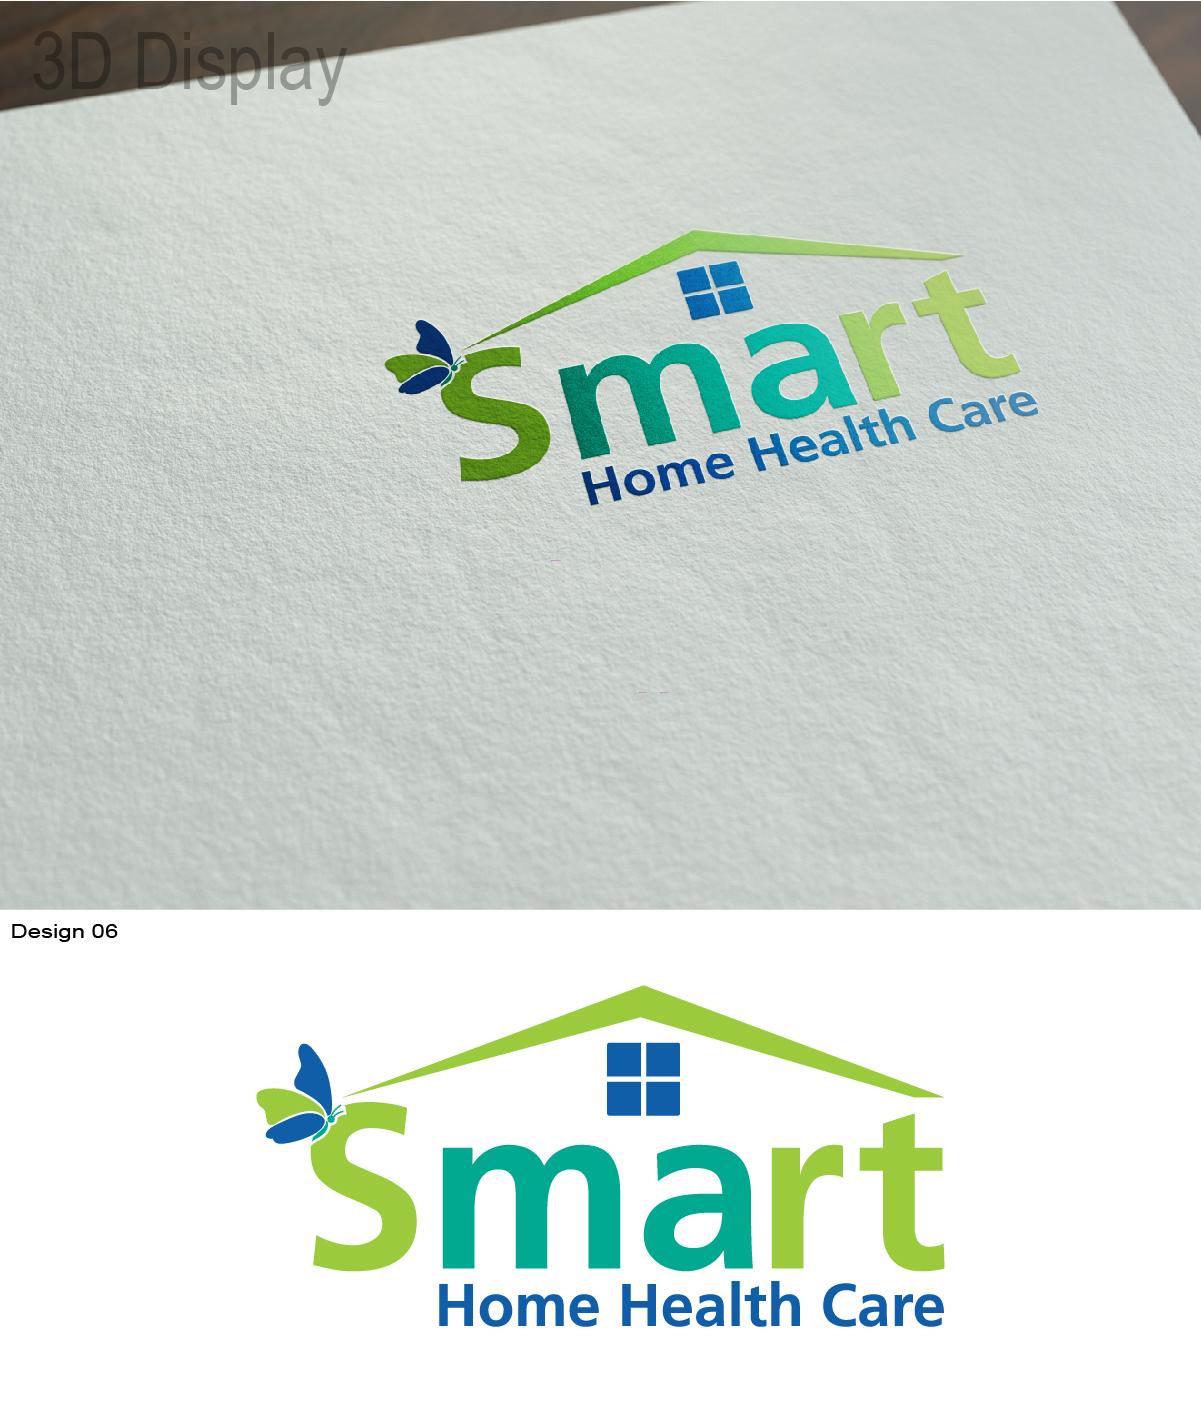 Modern Upmarket Business Logo Design For Smart Home Health Care By Blacknwhite Design 7716905